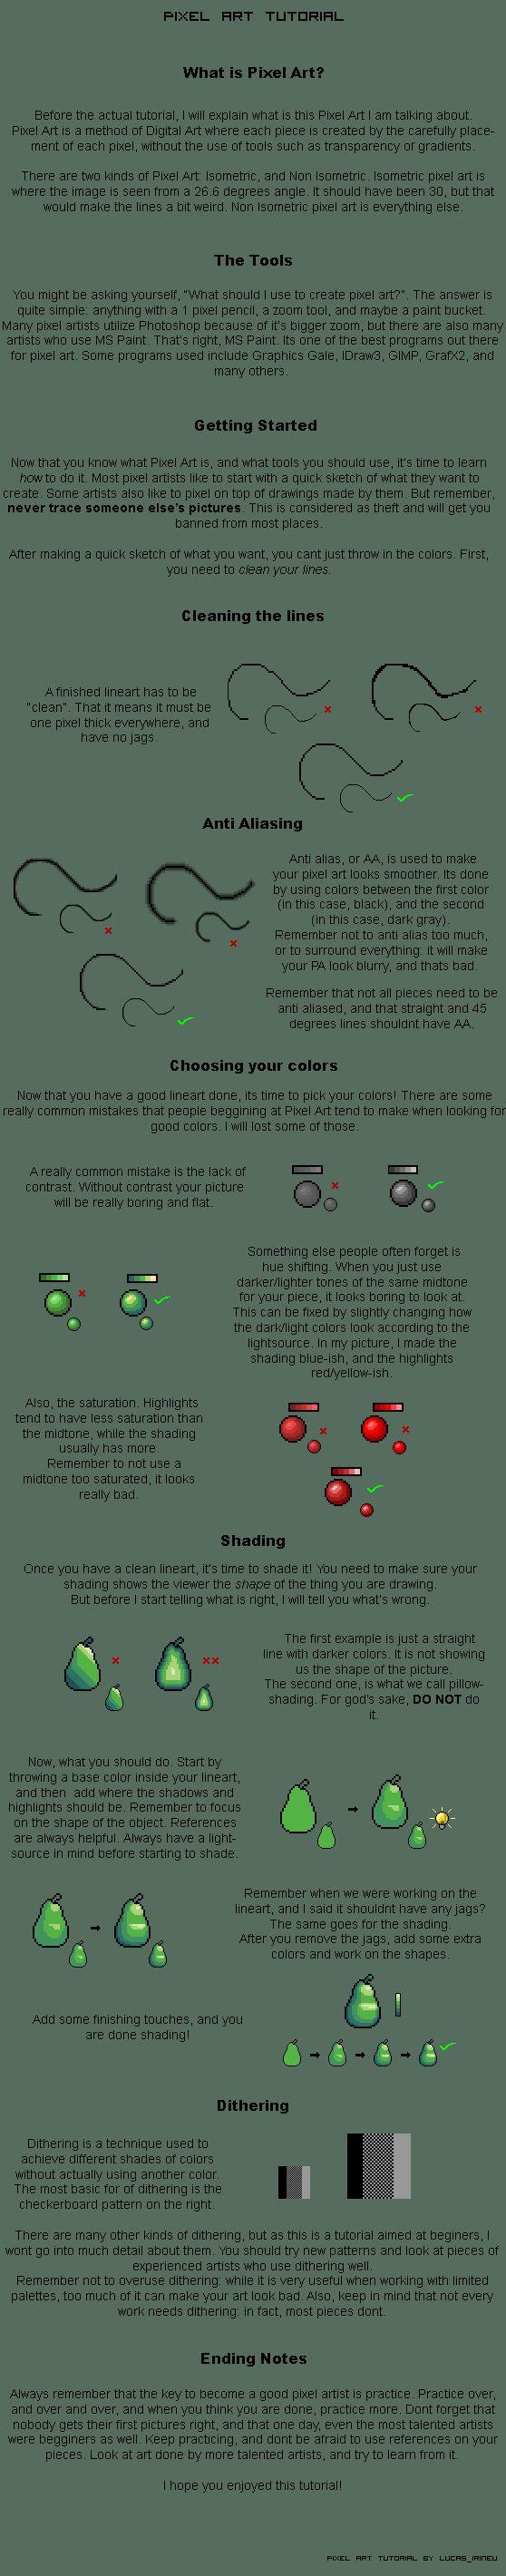 Pixel Art Character Design Tutorial : Best pixel art images on pinterest game